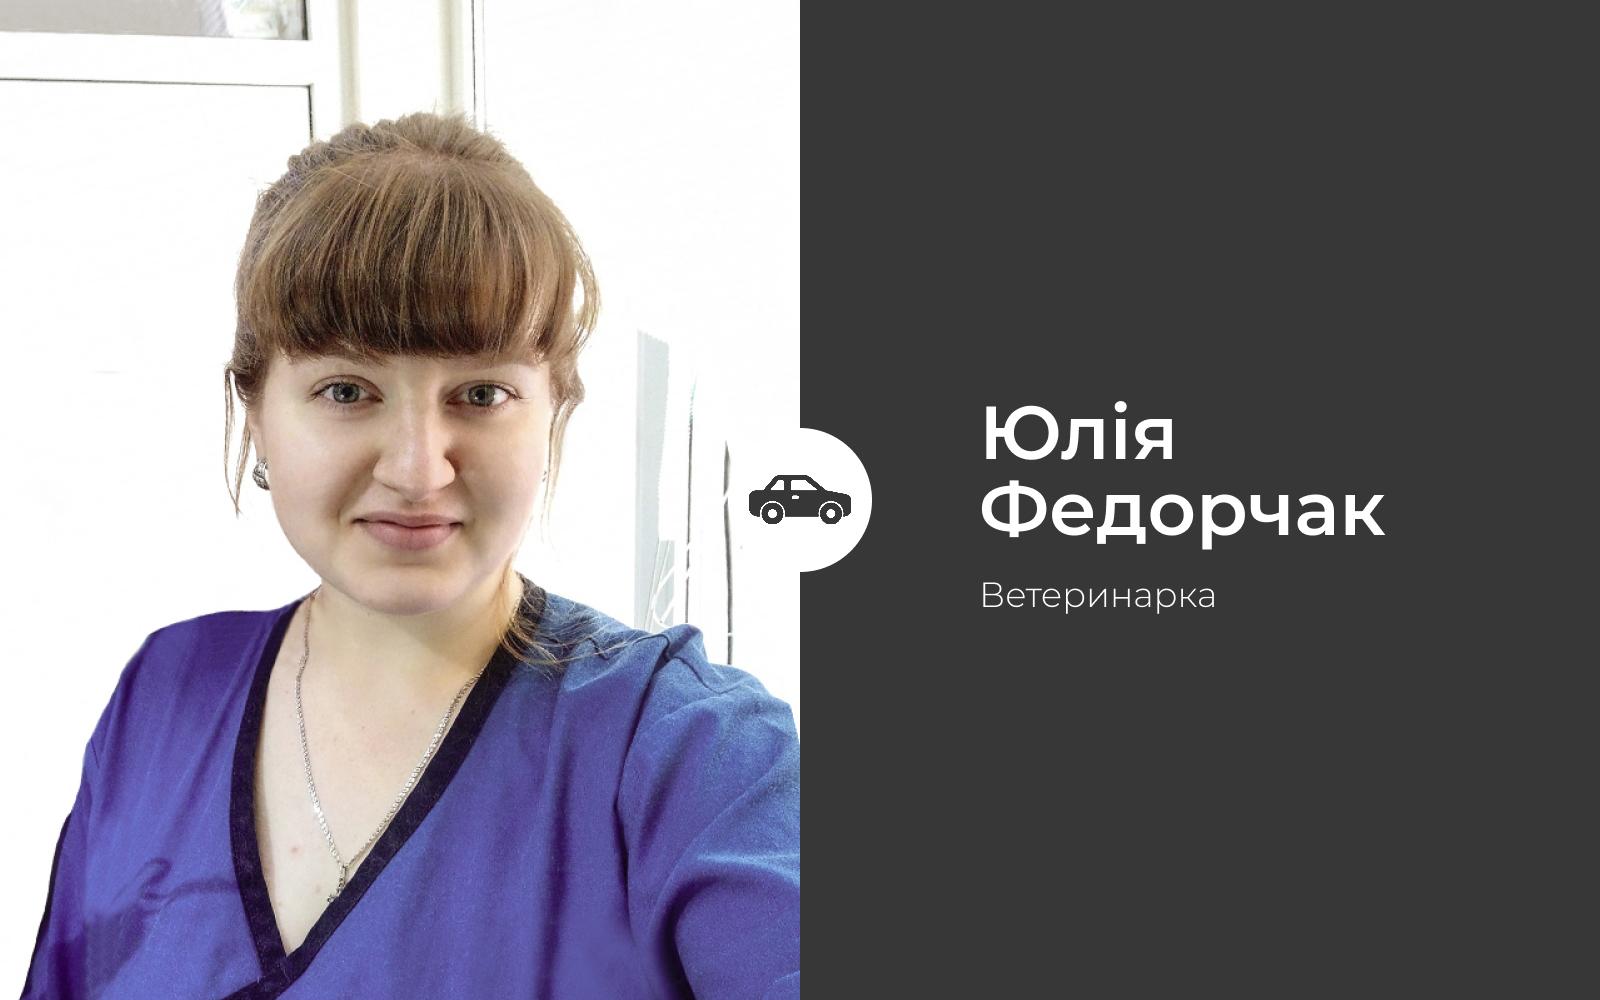 yuliya-fedorchak_блог_.18.6.21